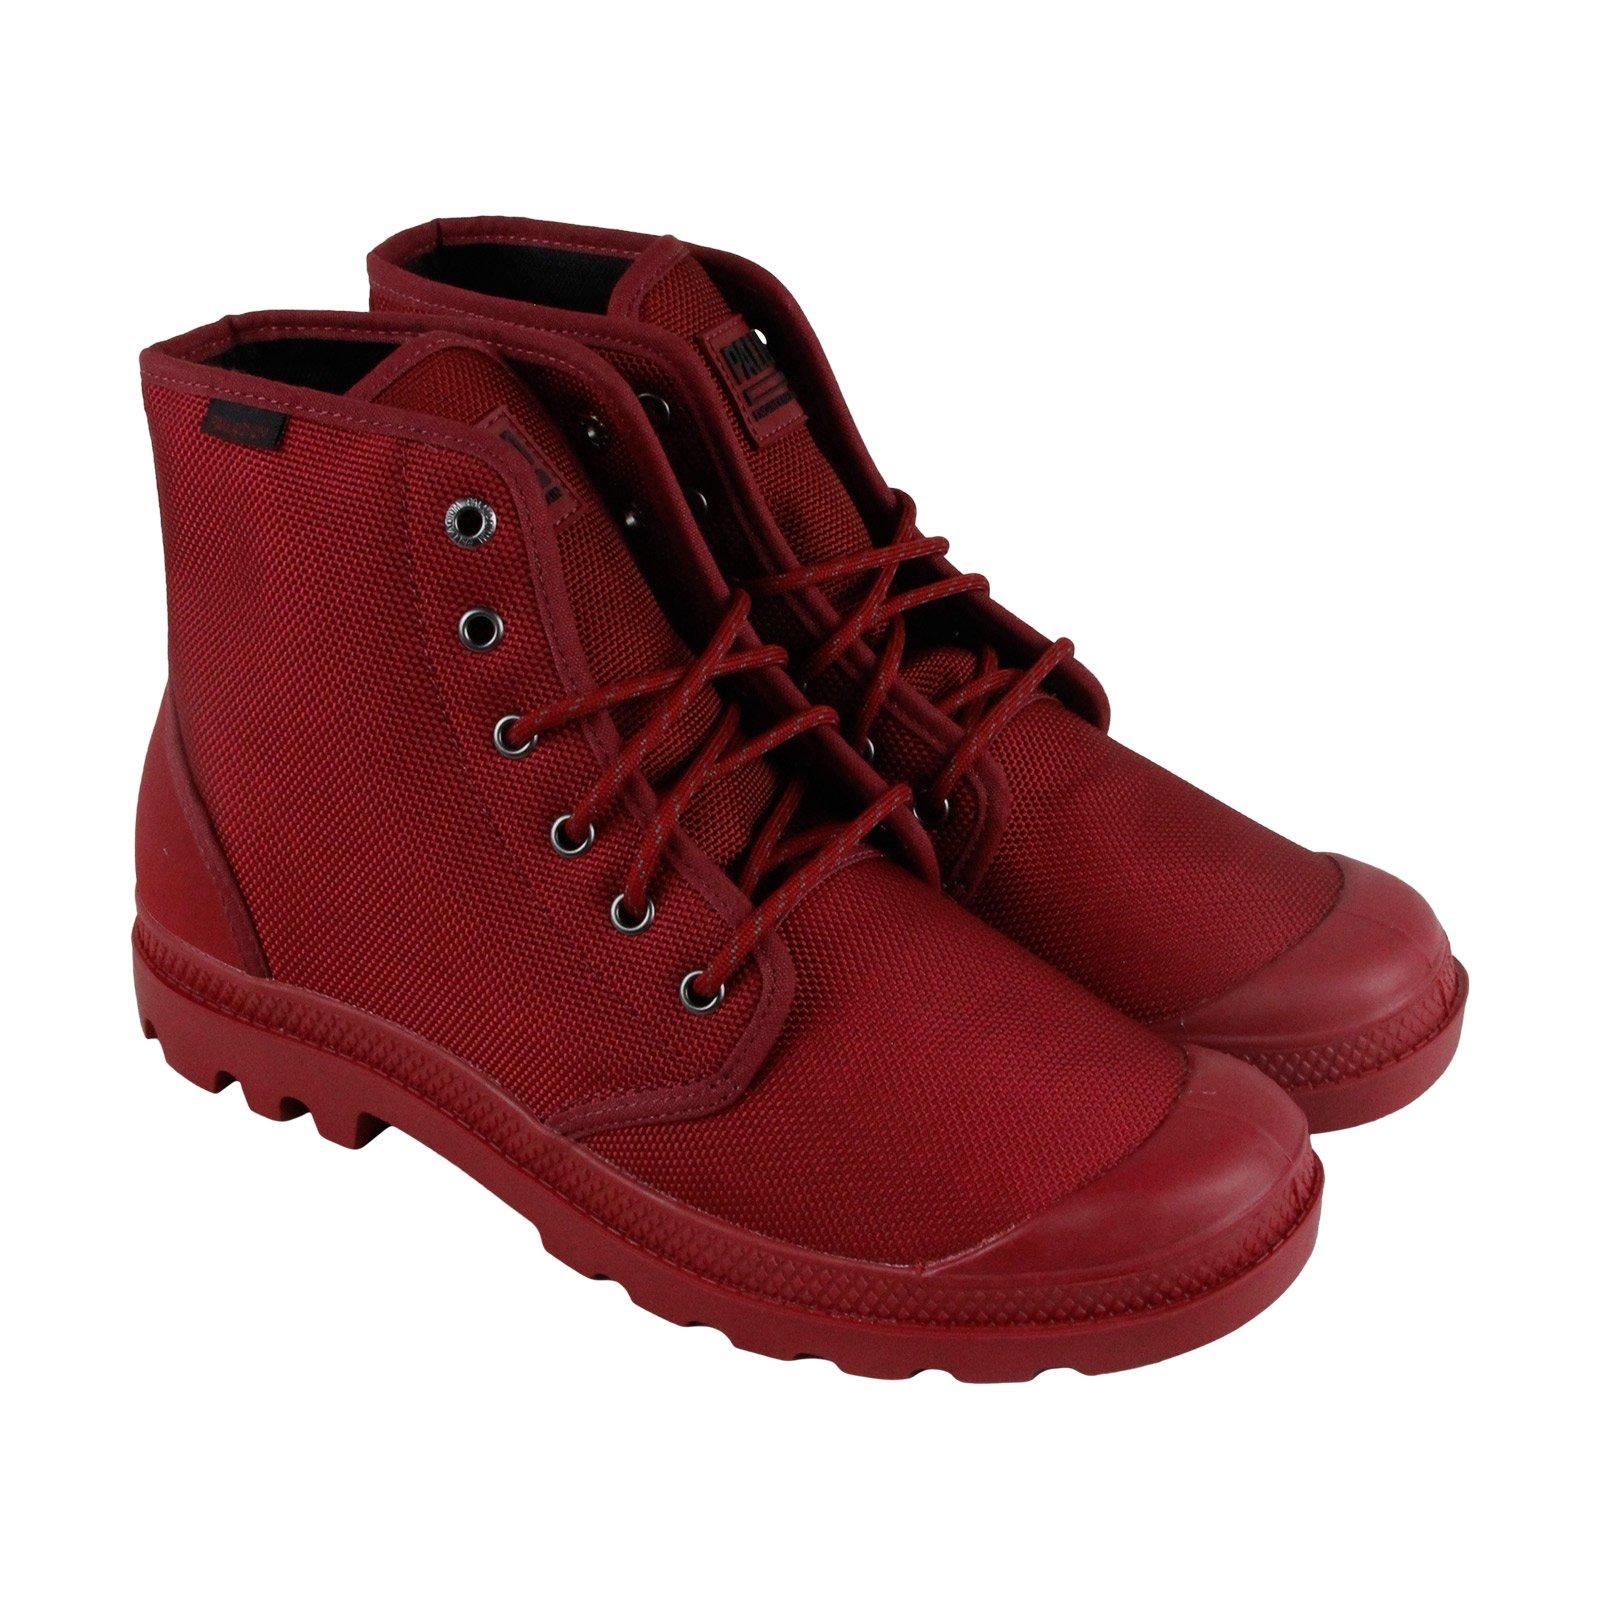 Palladium Pampa Hi Originale Mens Red Nylon Casual Dress Boots Shoes 14